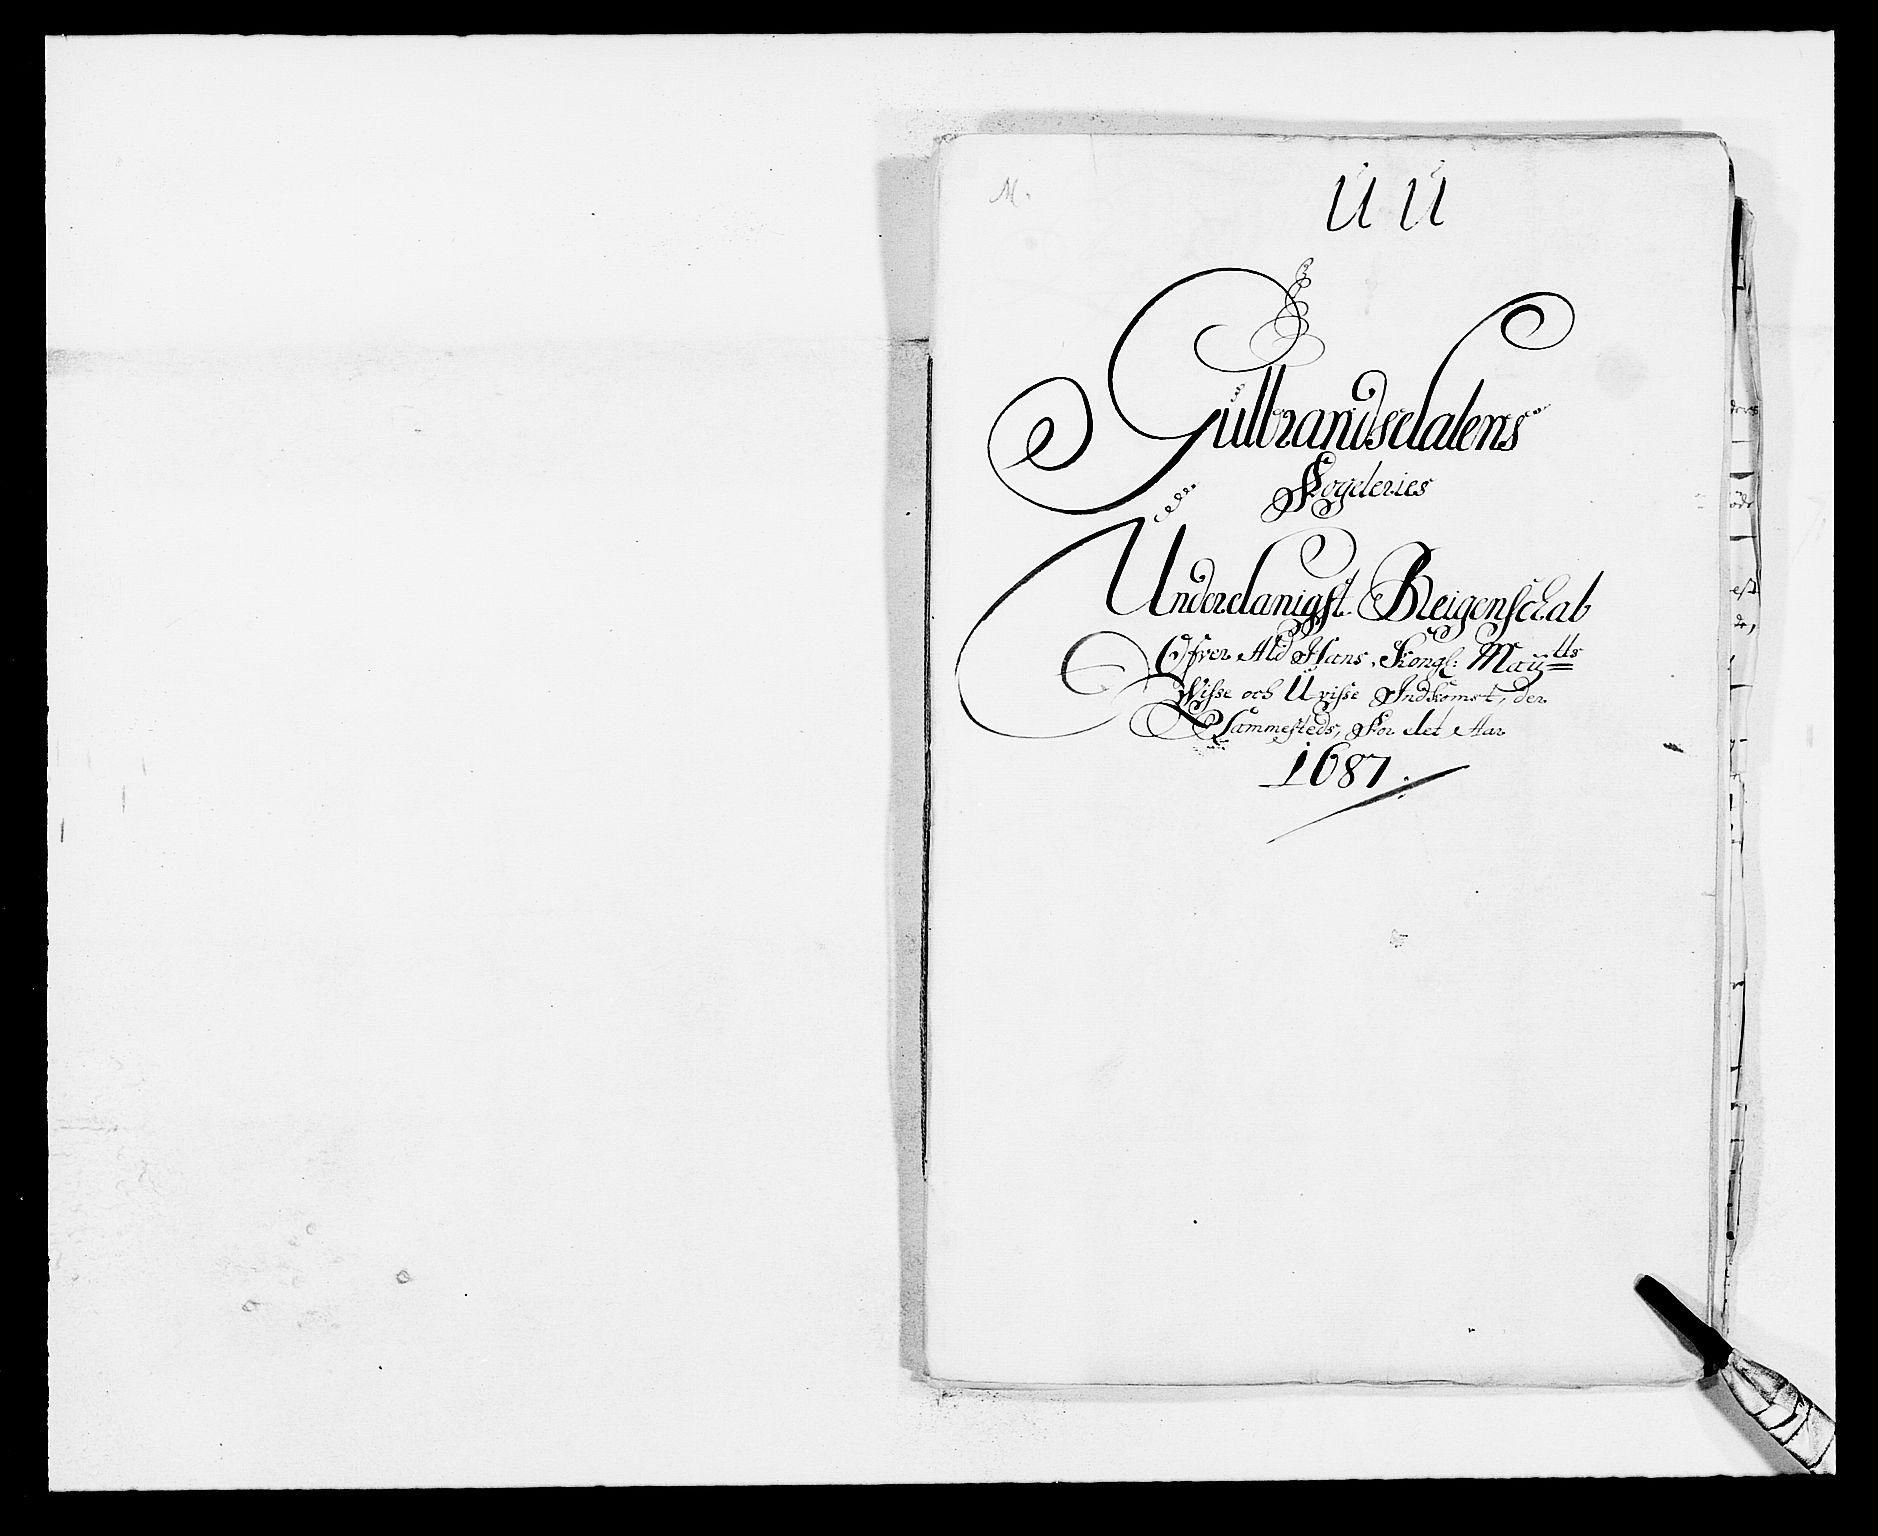 RA, Rentekammeret inntil 1814, Reviderte regnskaper, Fogderegnskap, R17/L1162: Fogderegnskap Gudbrandsdal, 1682-1689, s. 1